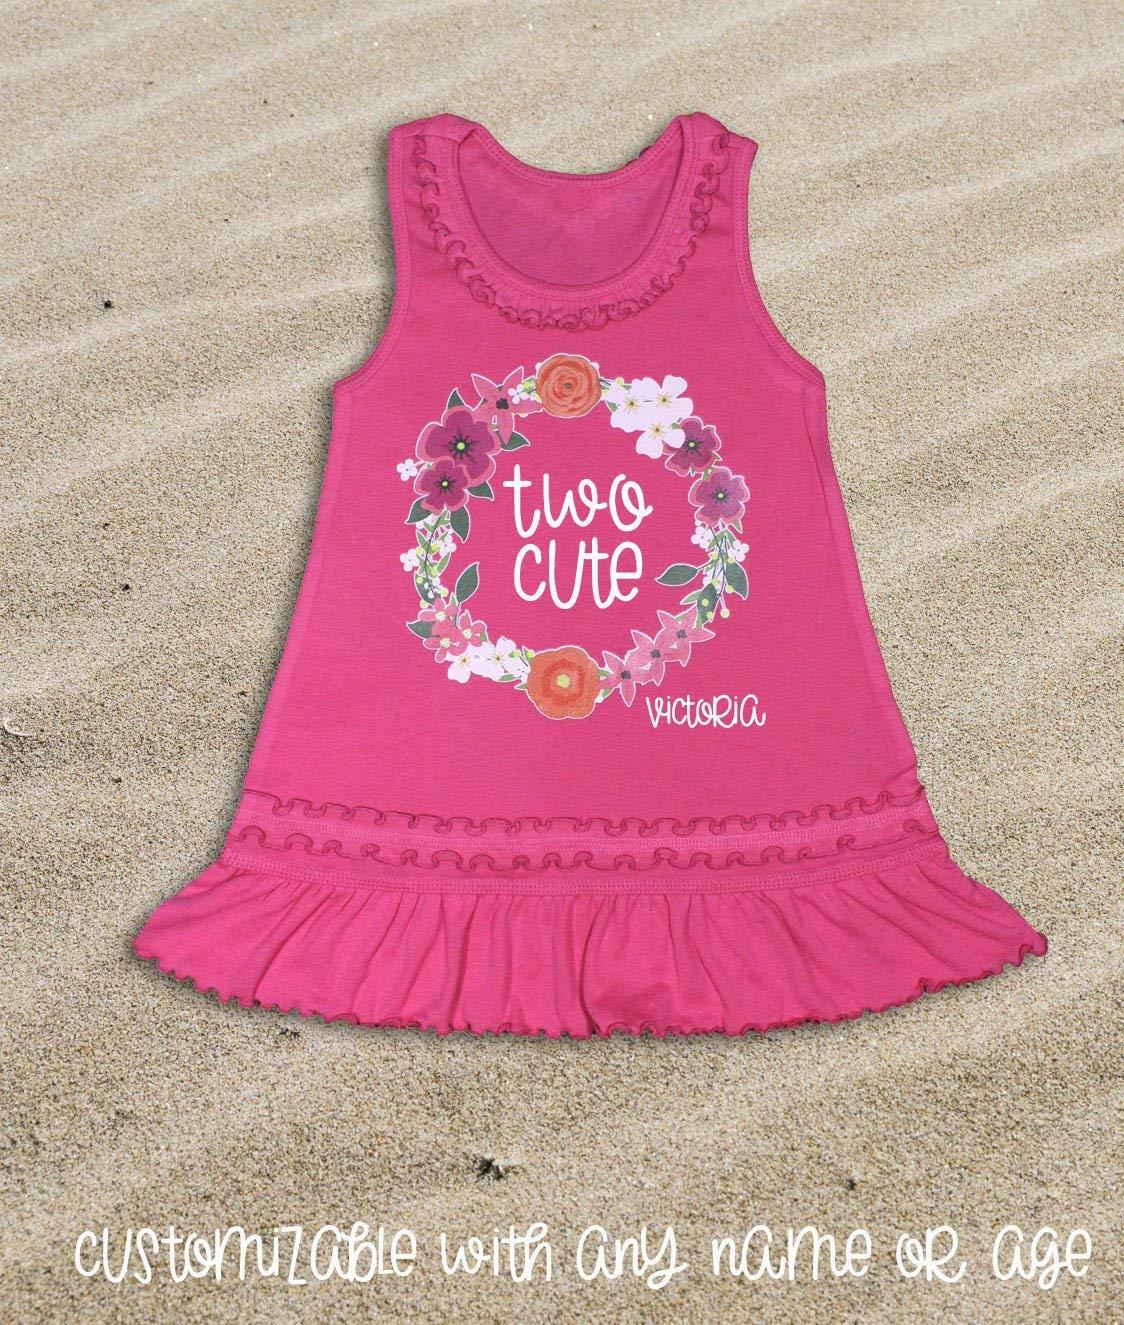 078148cb4 2nd Birthday Outfit Second Birthday Dress Girl's 2nd Birthday Dress Two  Cute Dress I'm